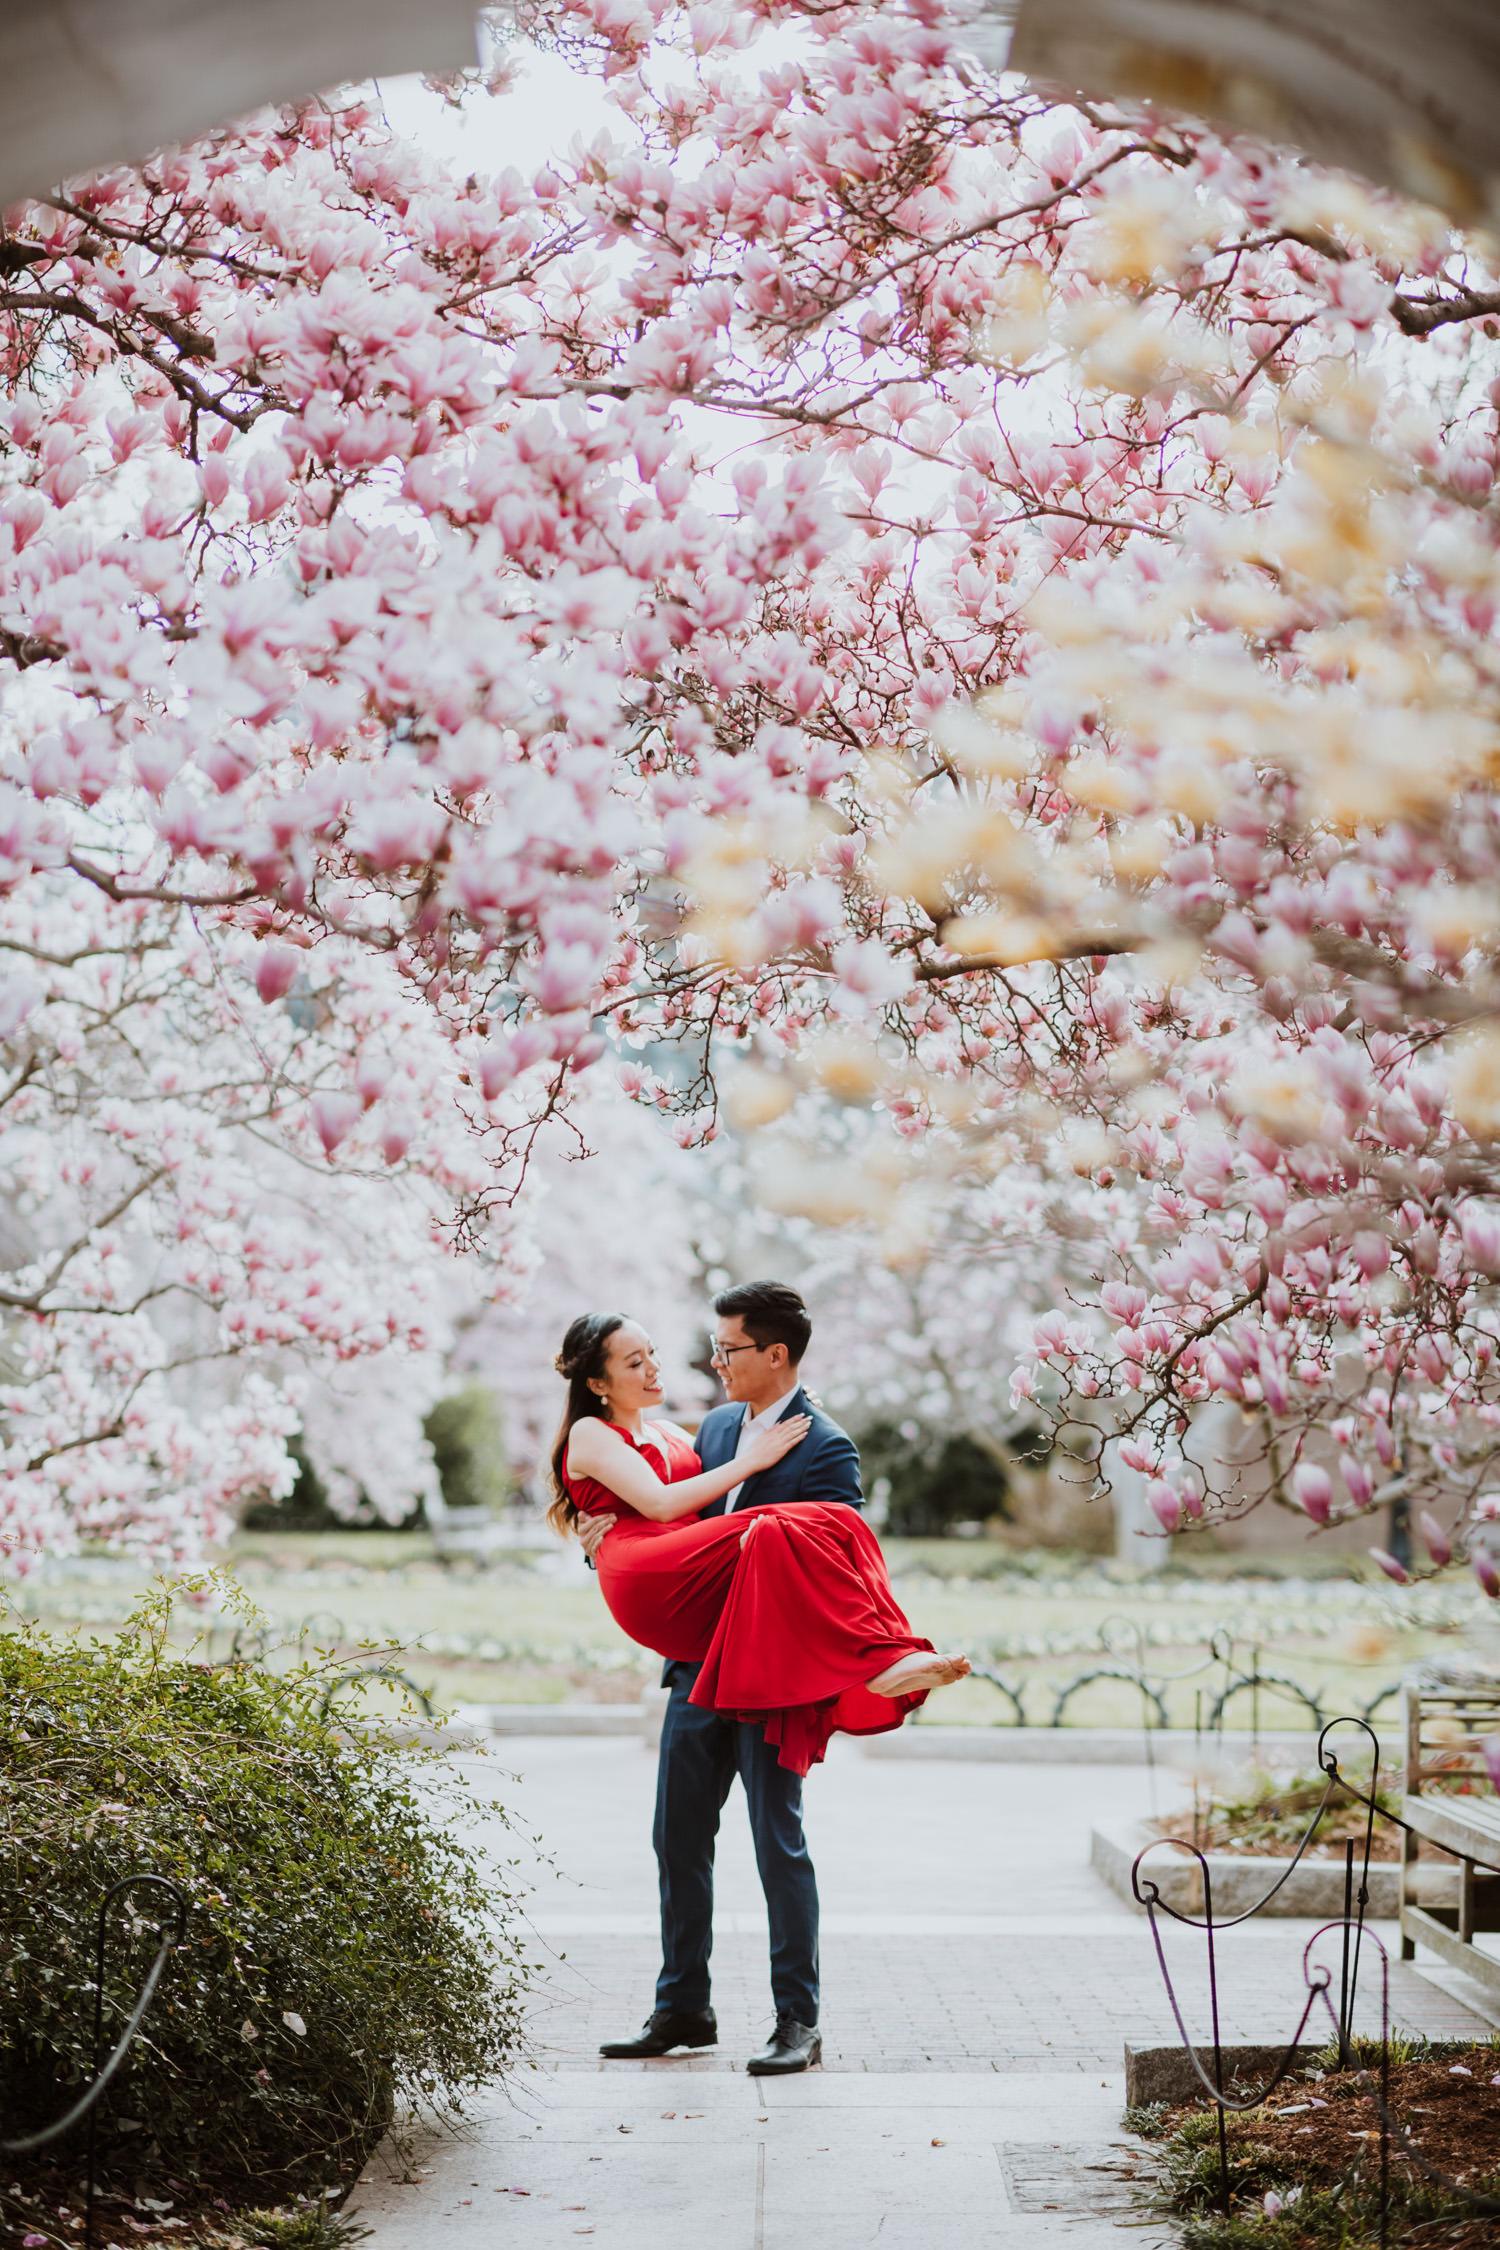 Enid A. Haupt Garden Magnolia Engagement Photo